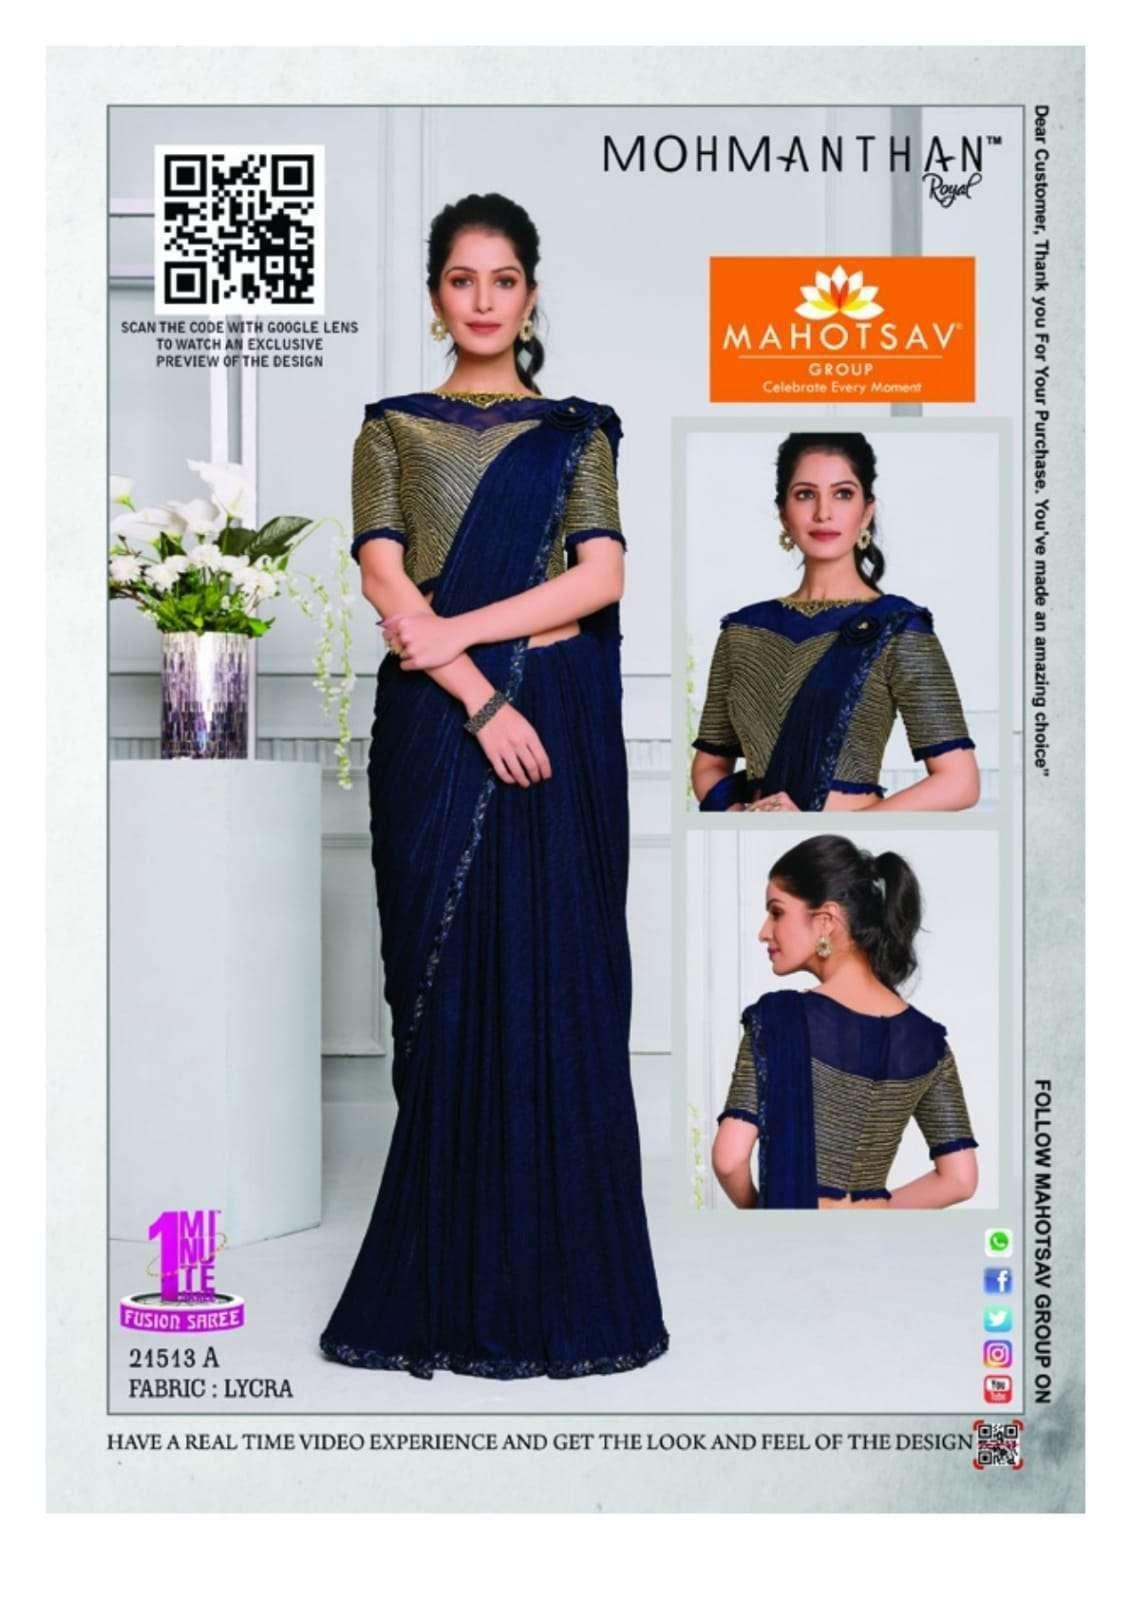 Mahotsav Moh Manthan Izzara 21501 To 215018 Series Fancy Designer Sarees Collection 21513